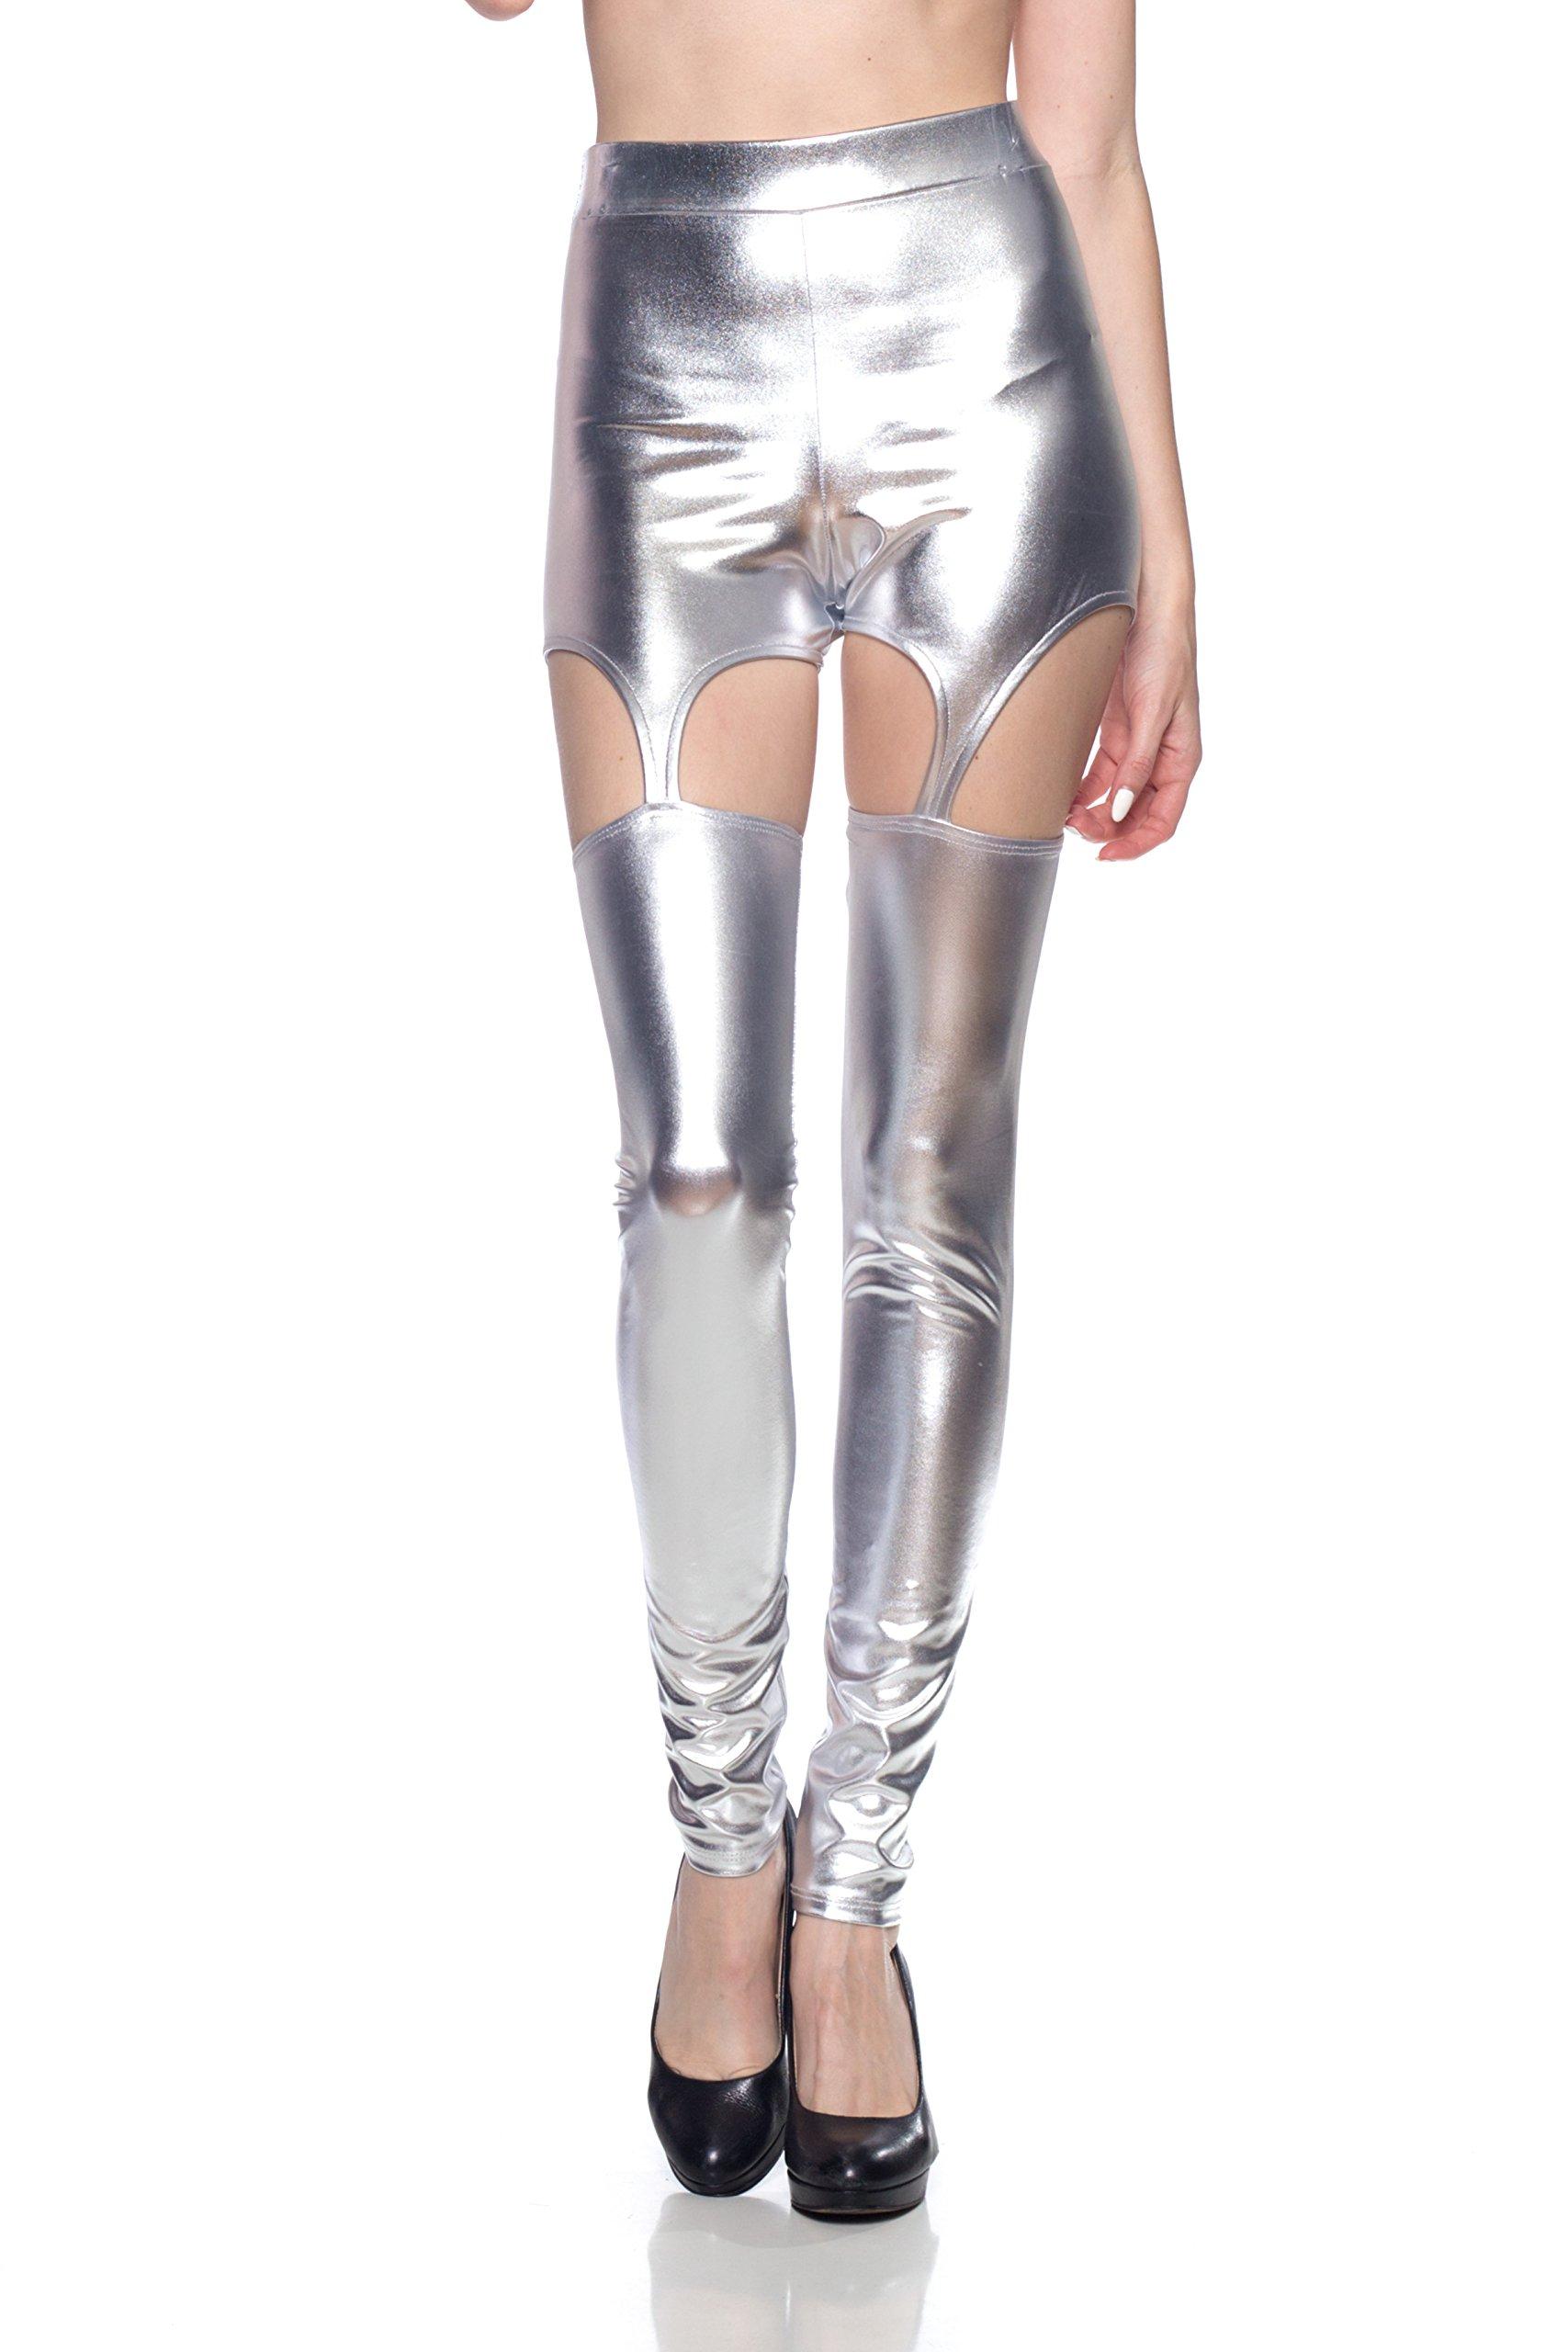 J2 Love Women's Faux Leather Garter Strap Cut Out Leggings, Large, Silver